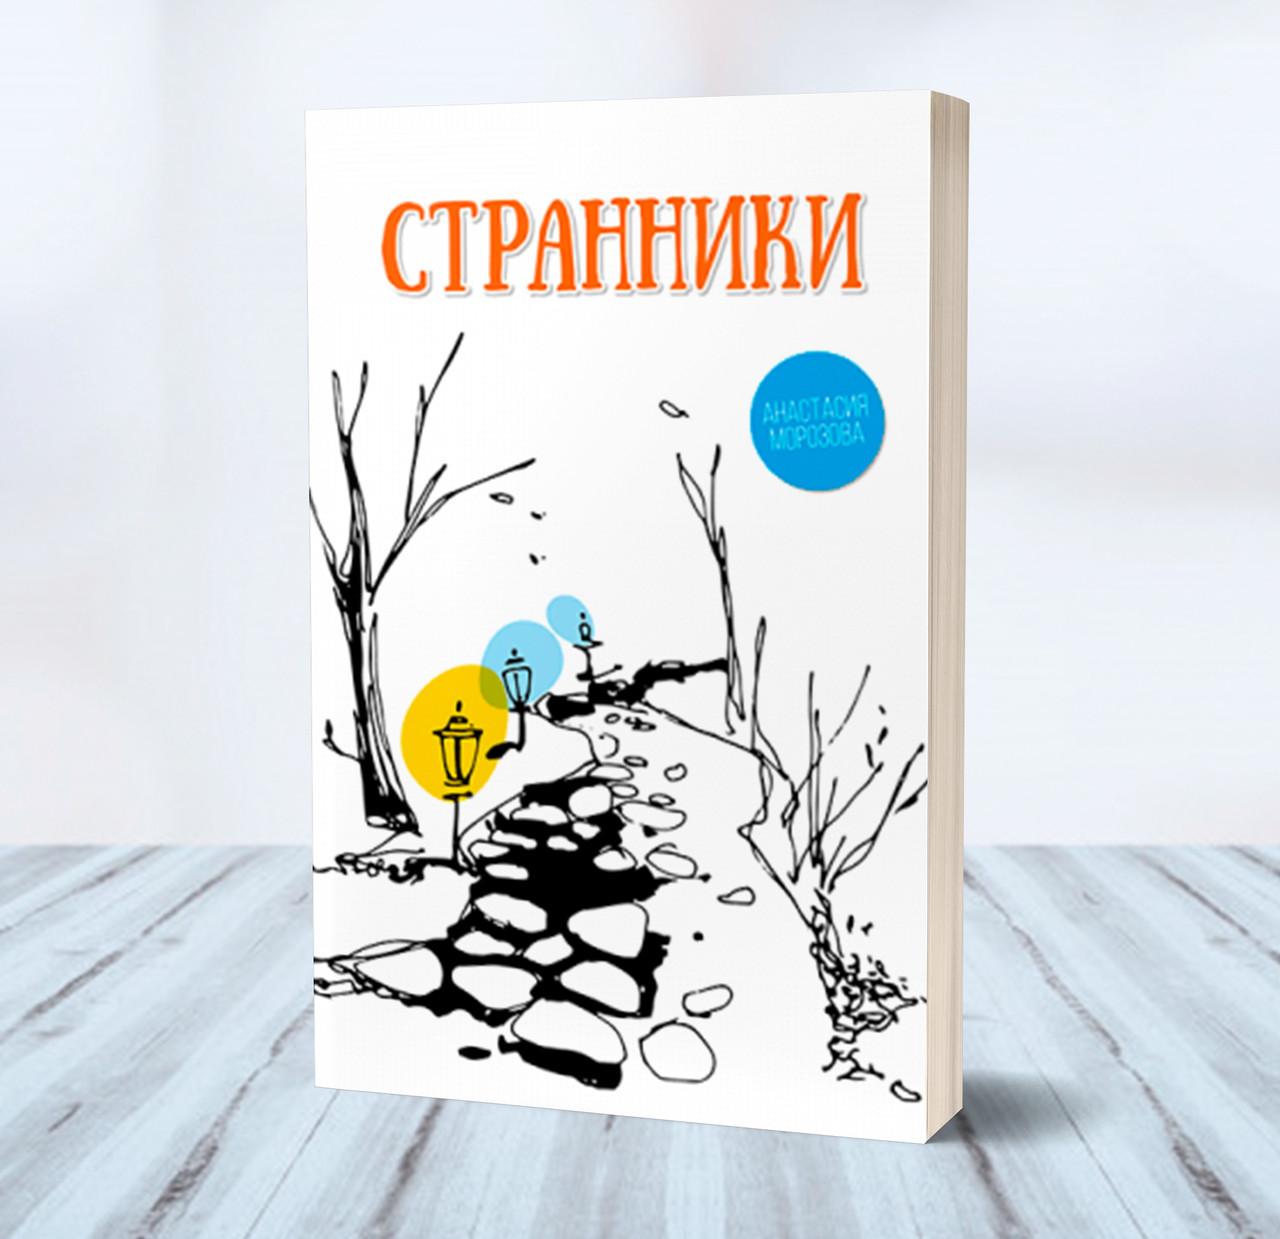 Странники – Анастасия Морозова